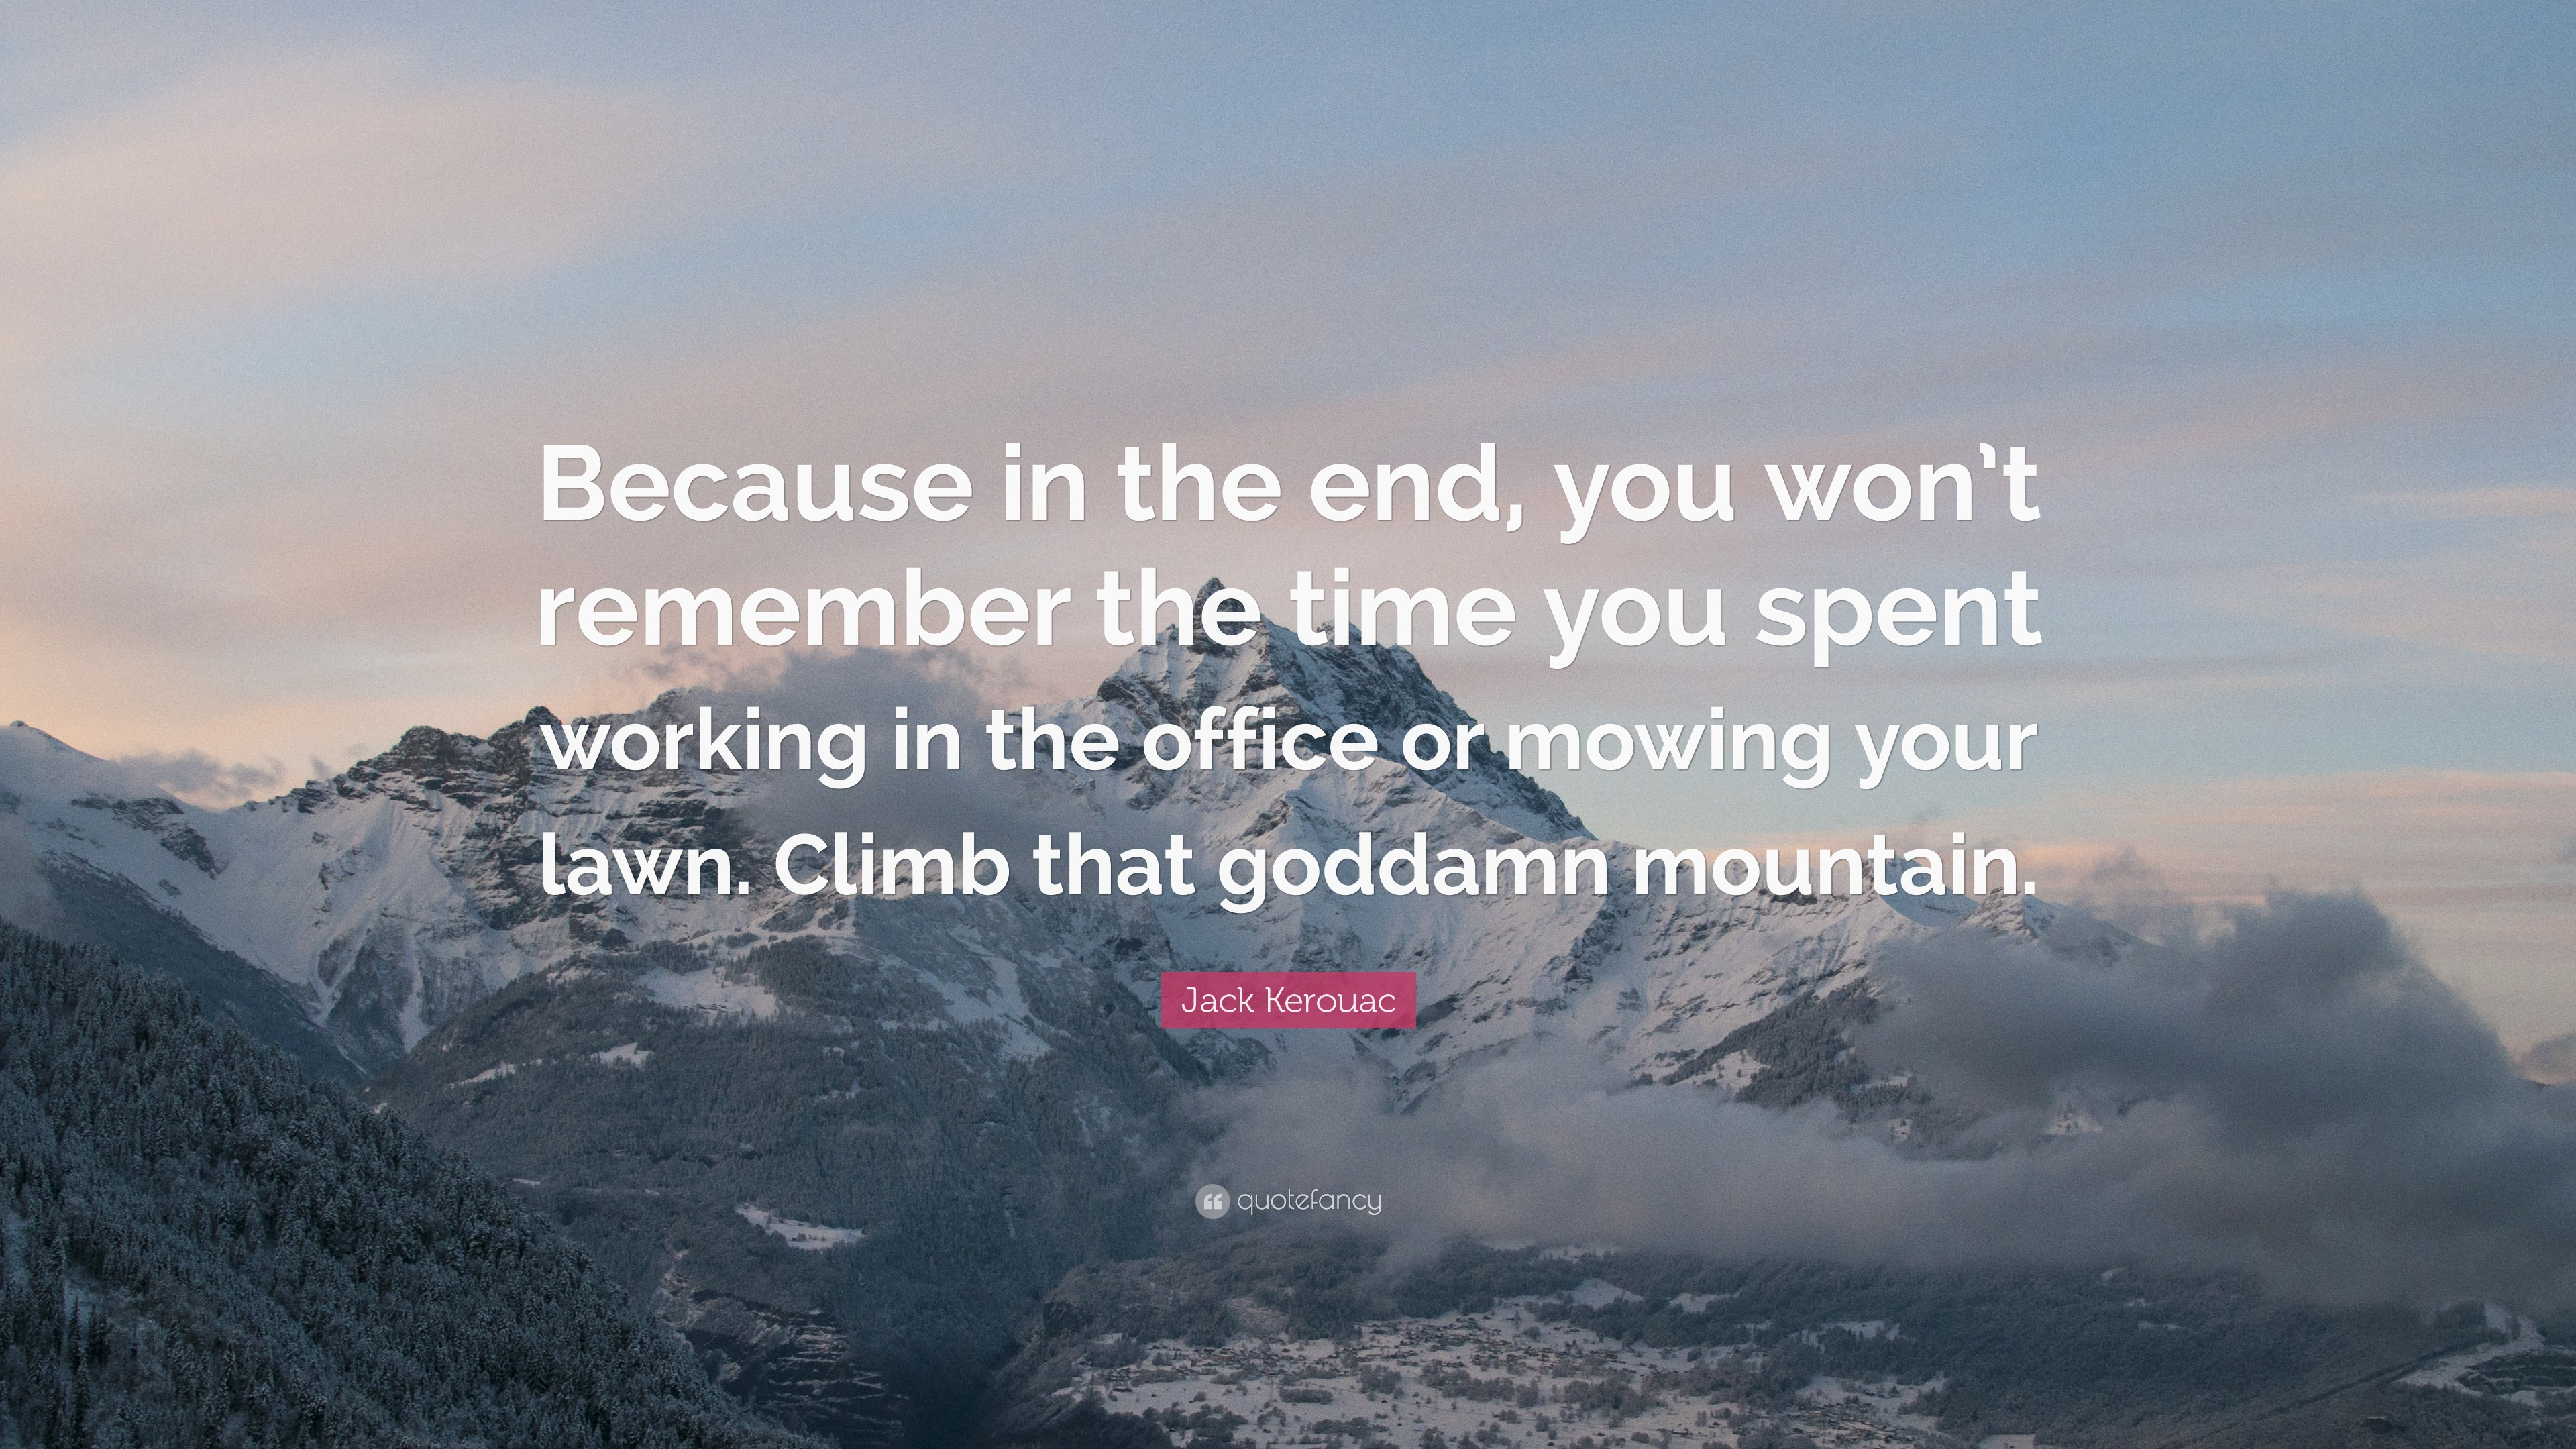 Jon franklin quotes